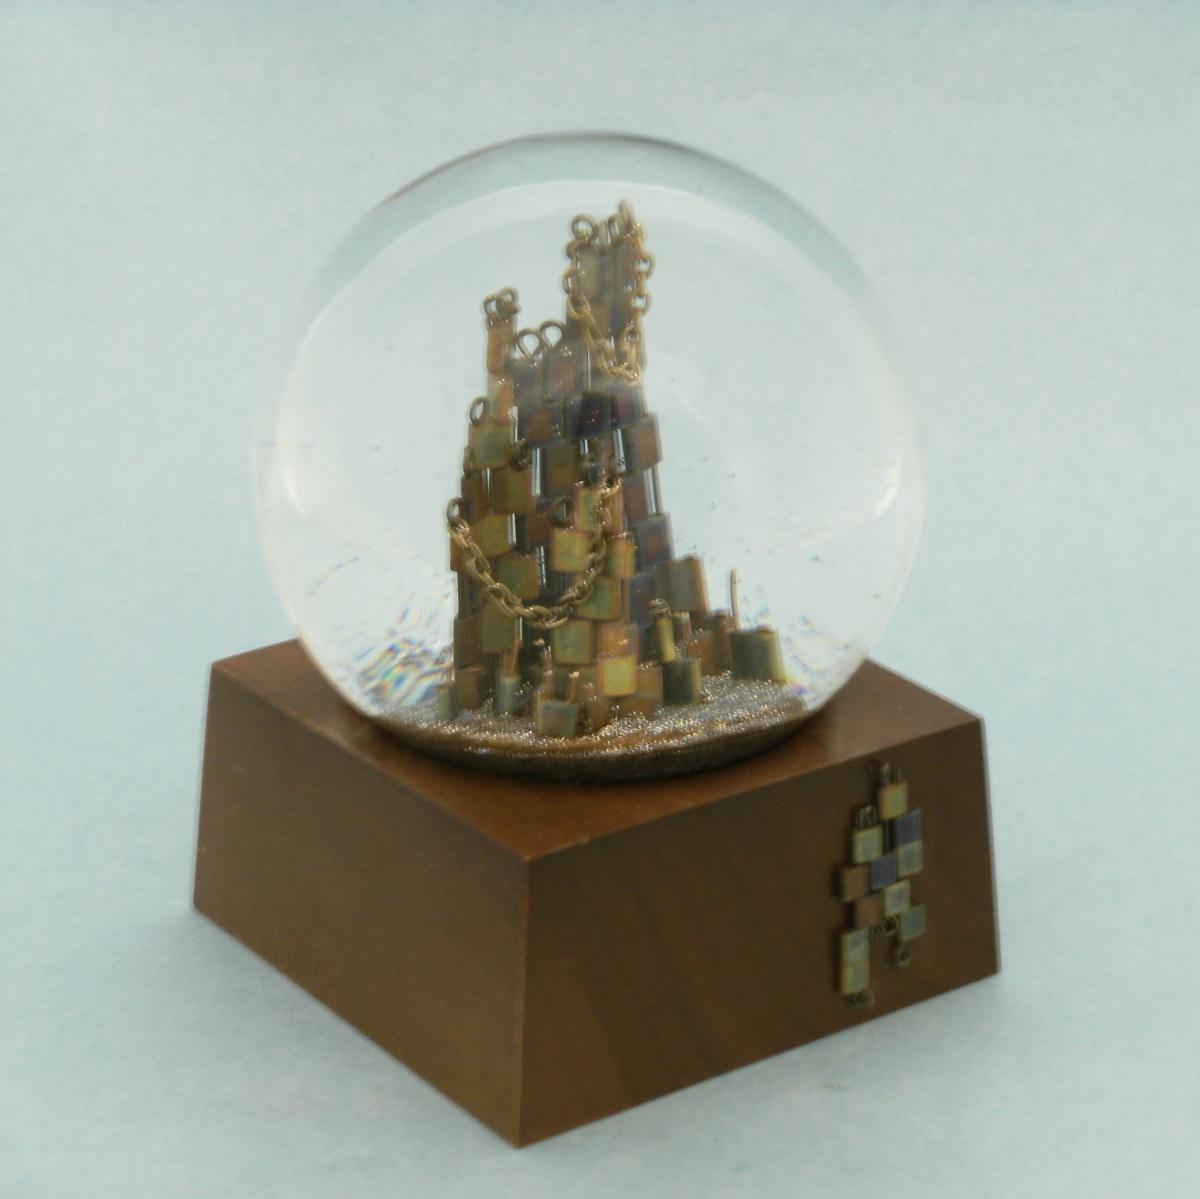 Seeking Closure Snow Globe, Camryn Forrest Designs 2013